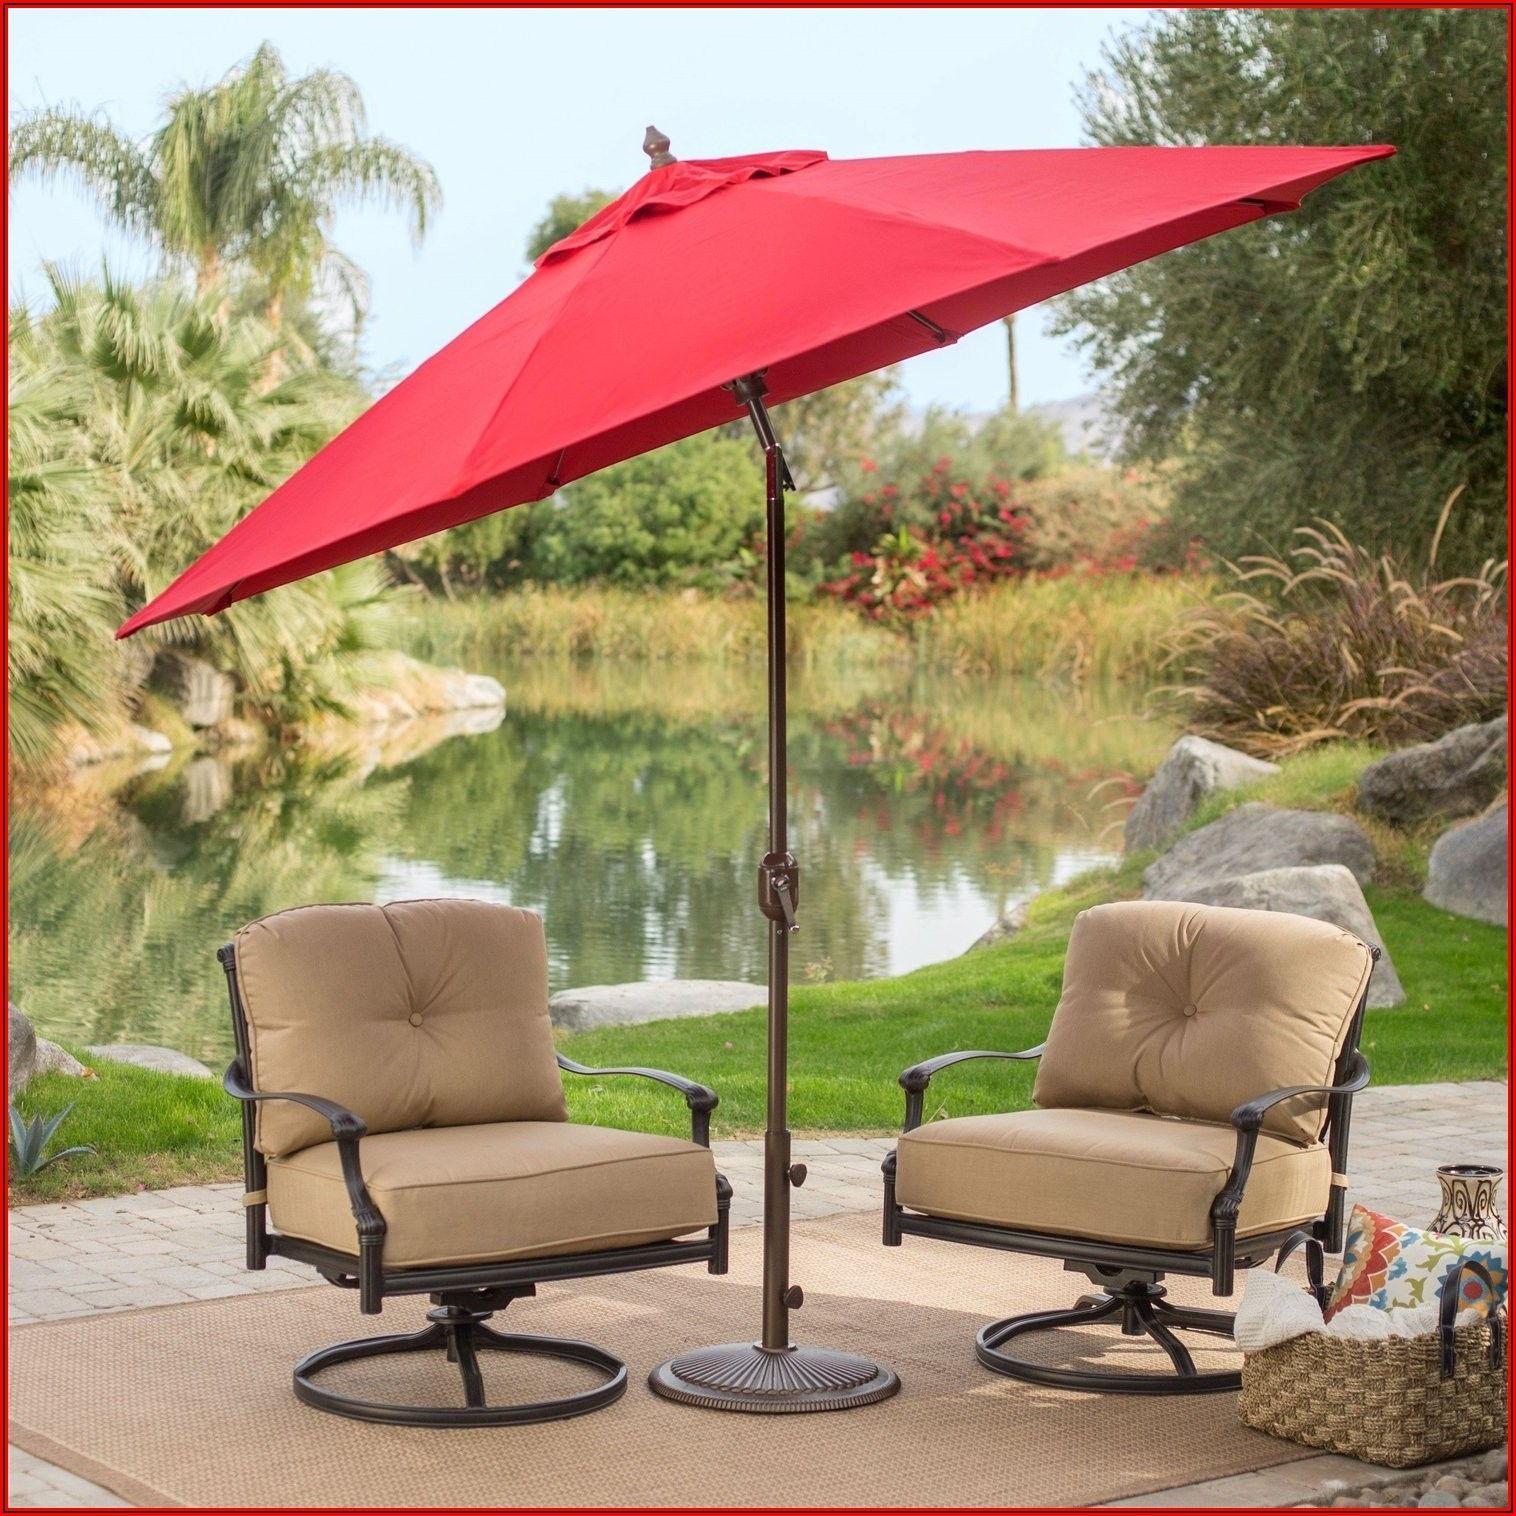 Red Patio Umbrella With Black Pole